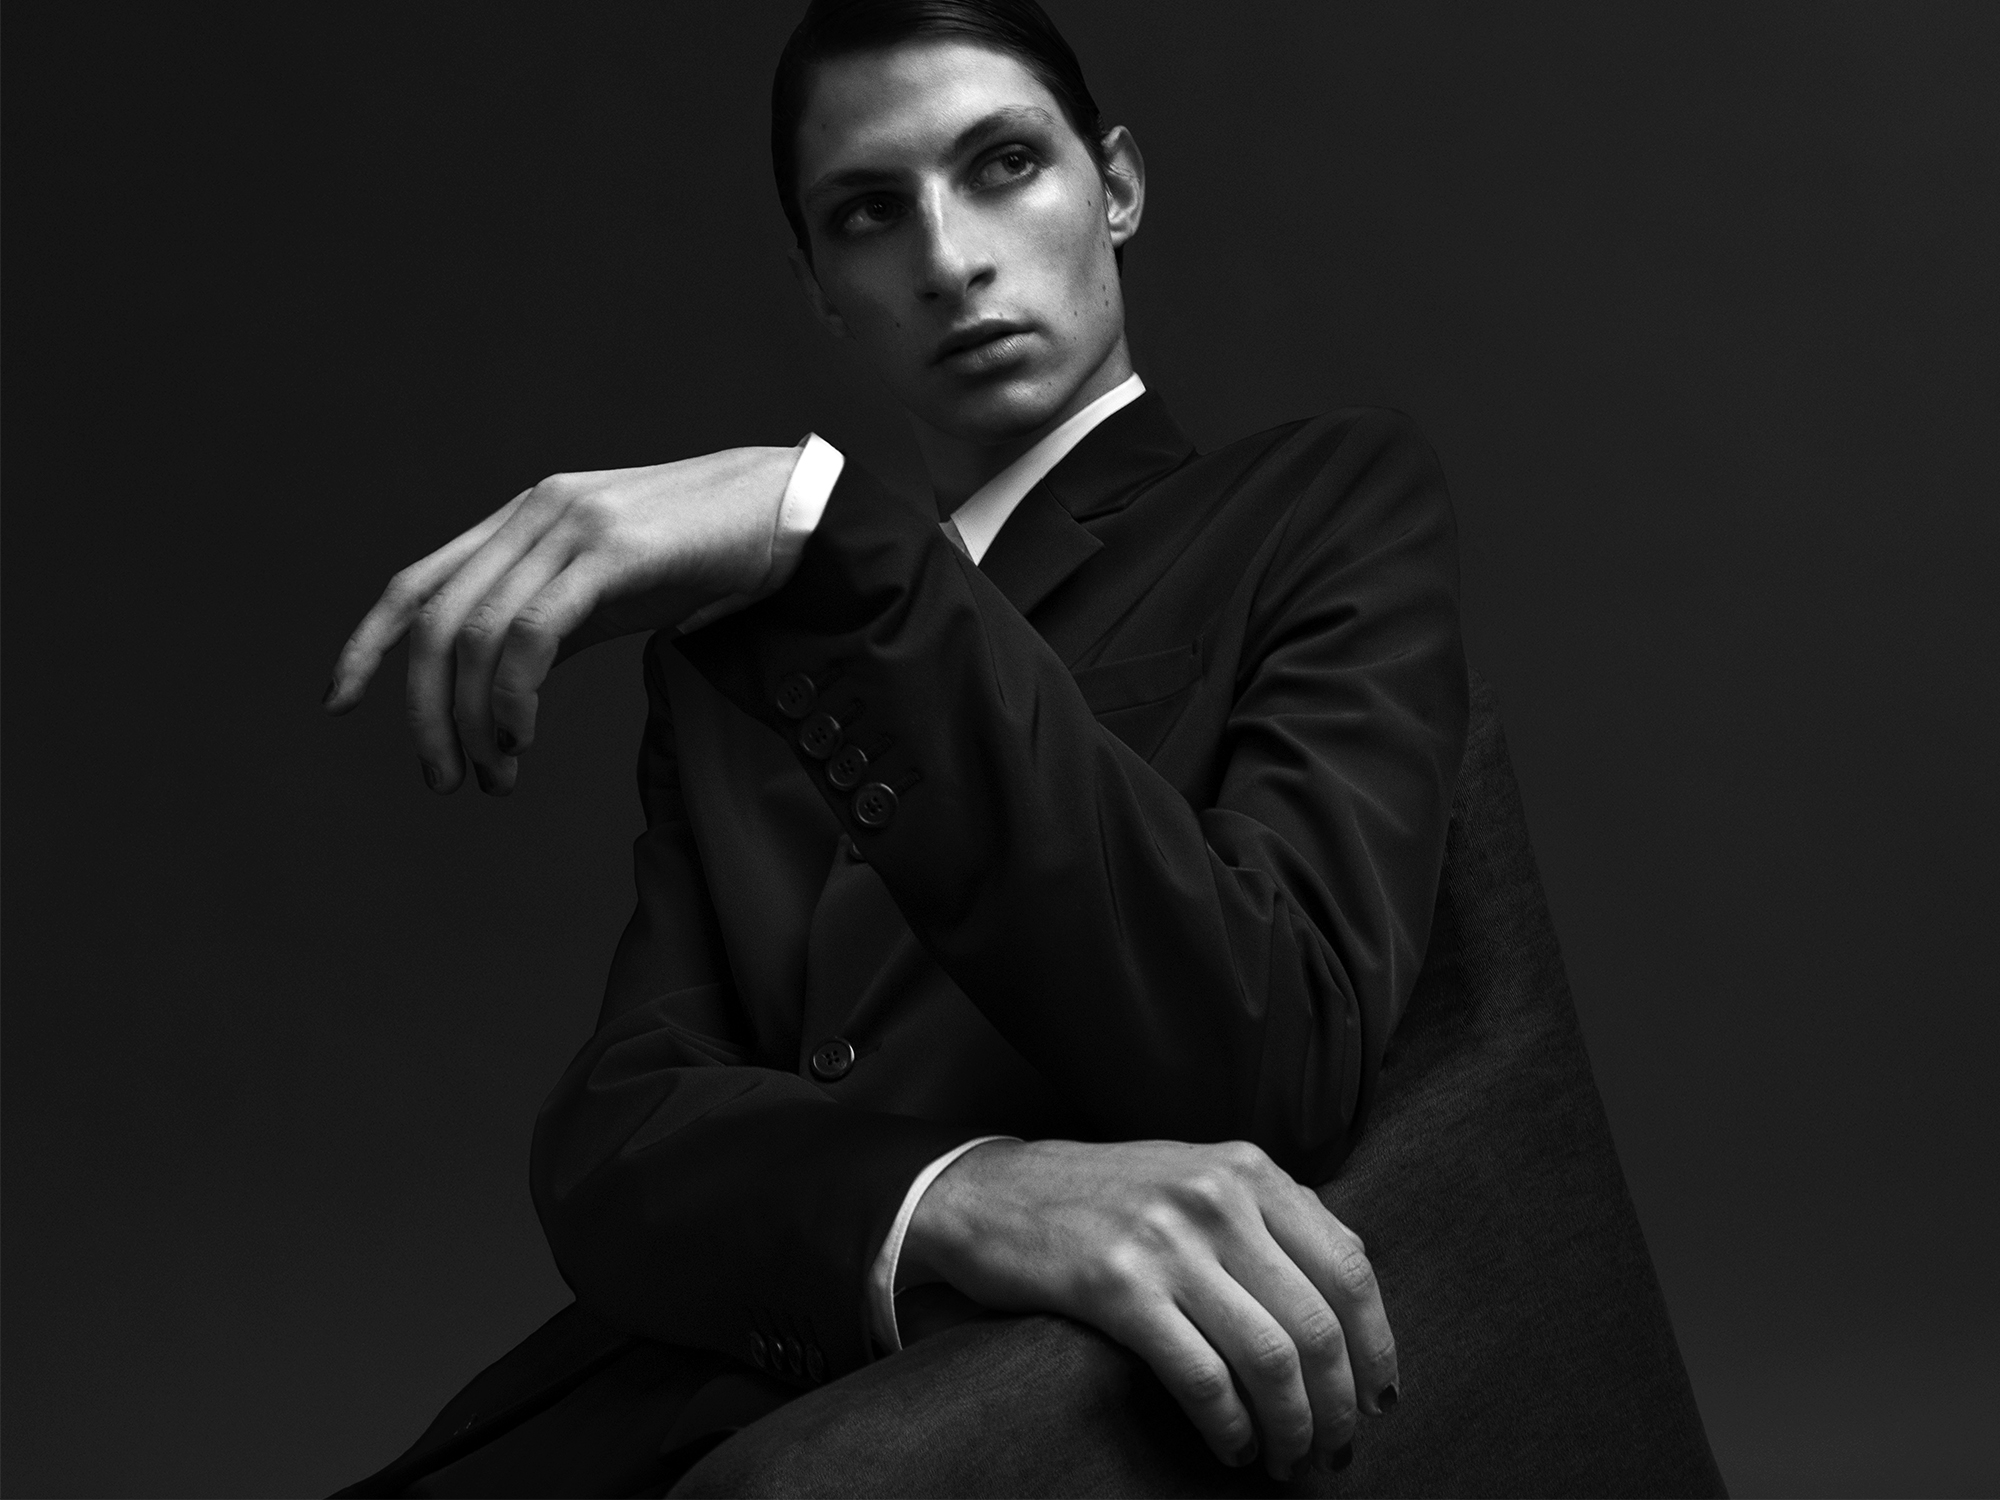 Justin @imgmodels @justindoress in Prada Homme ©Buonomo & Cometti